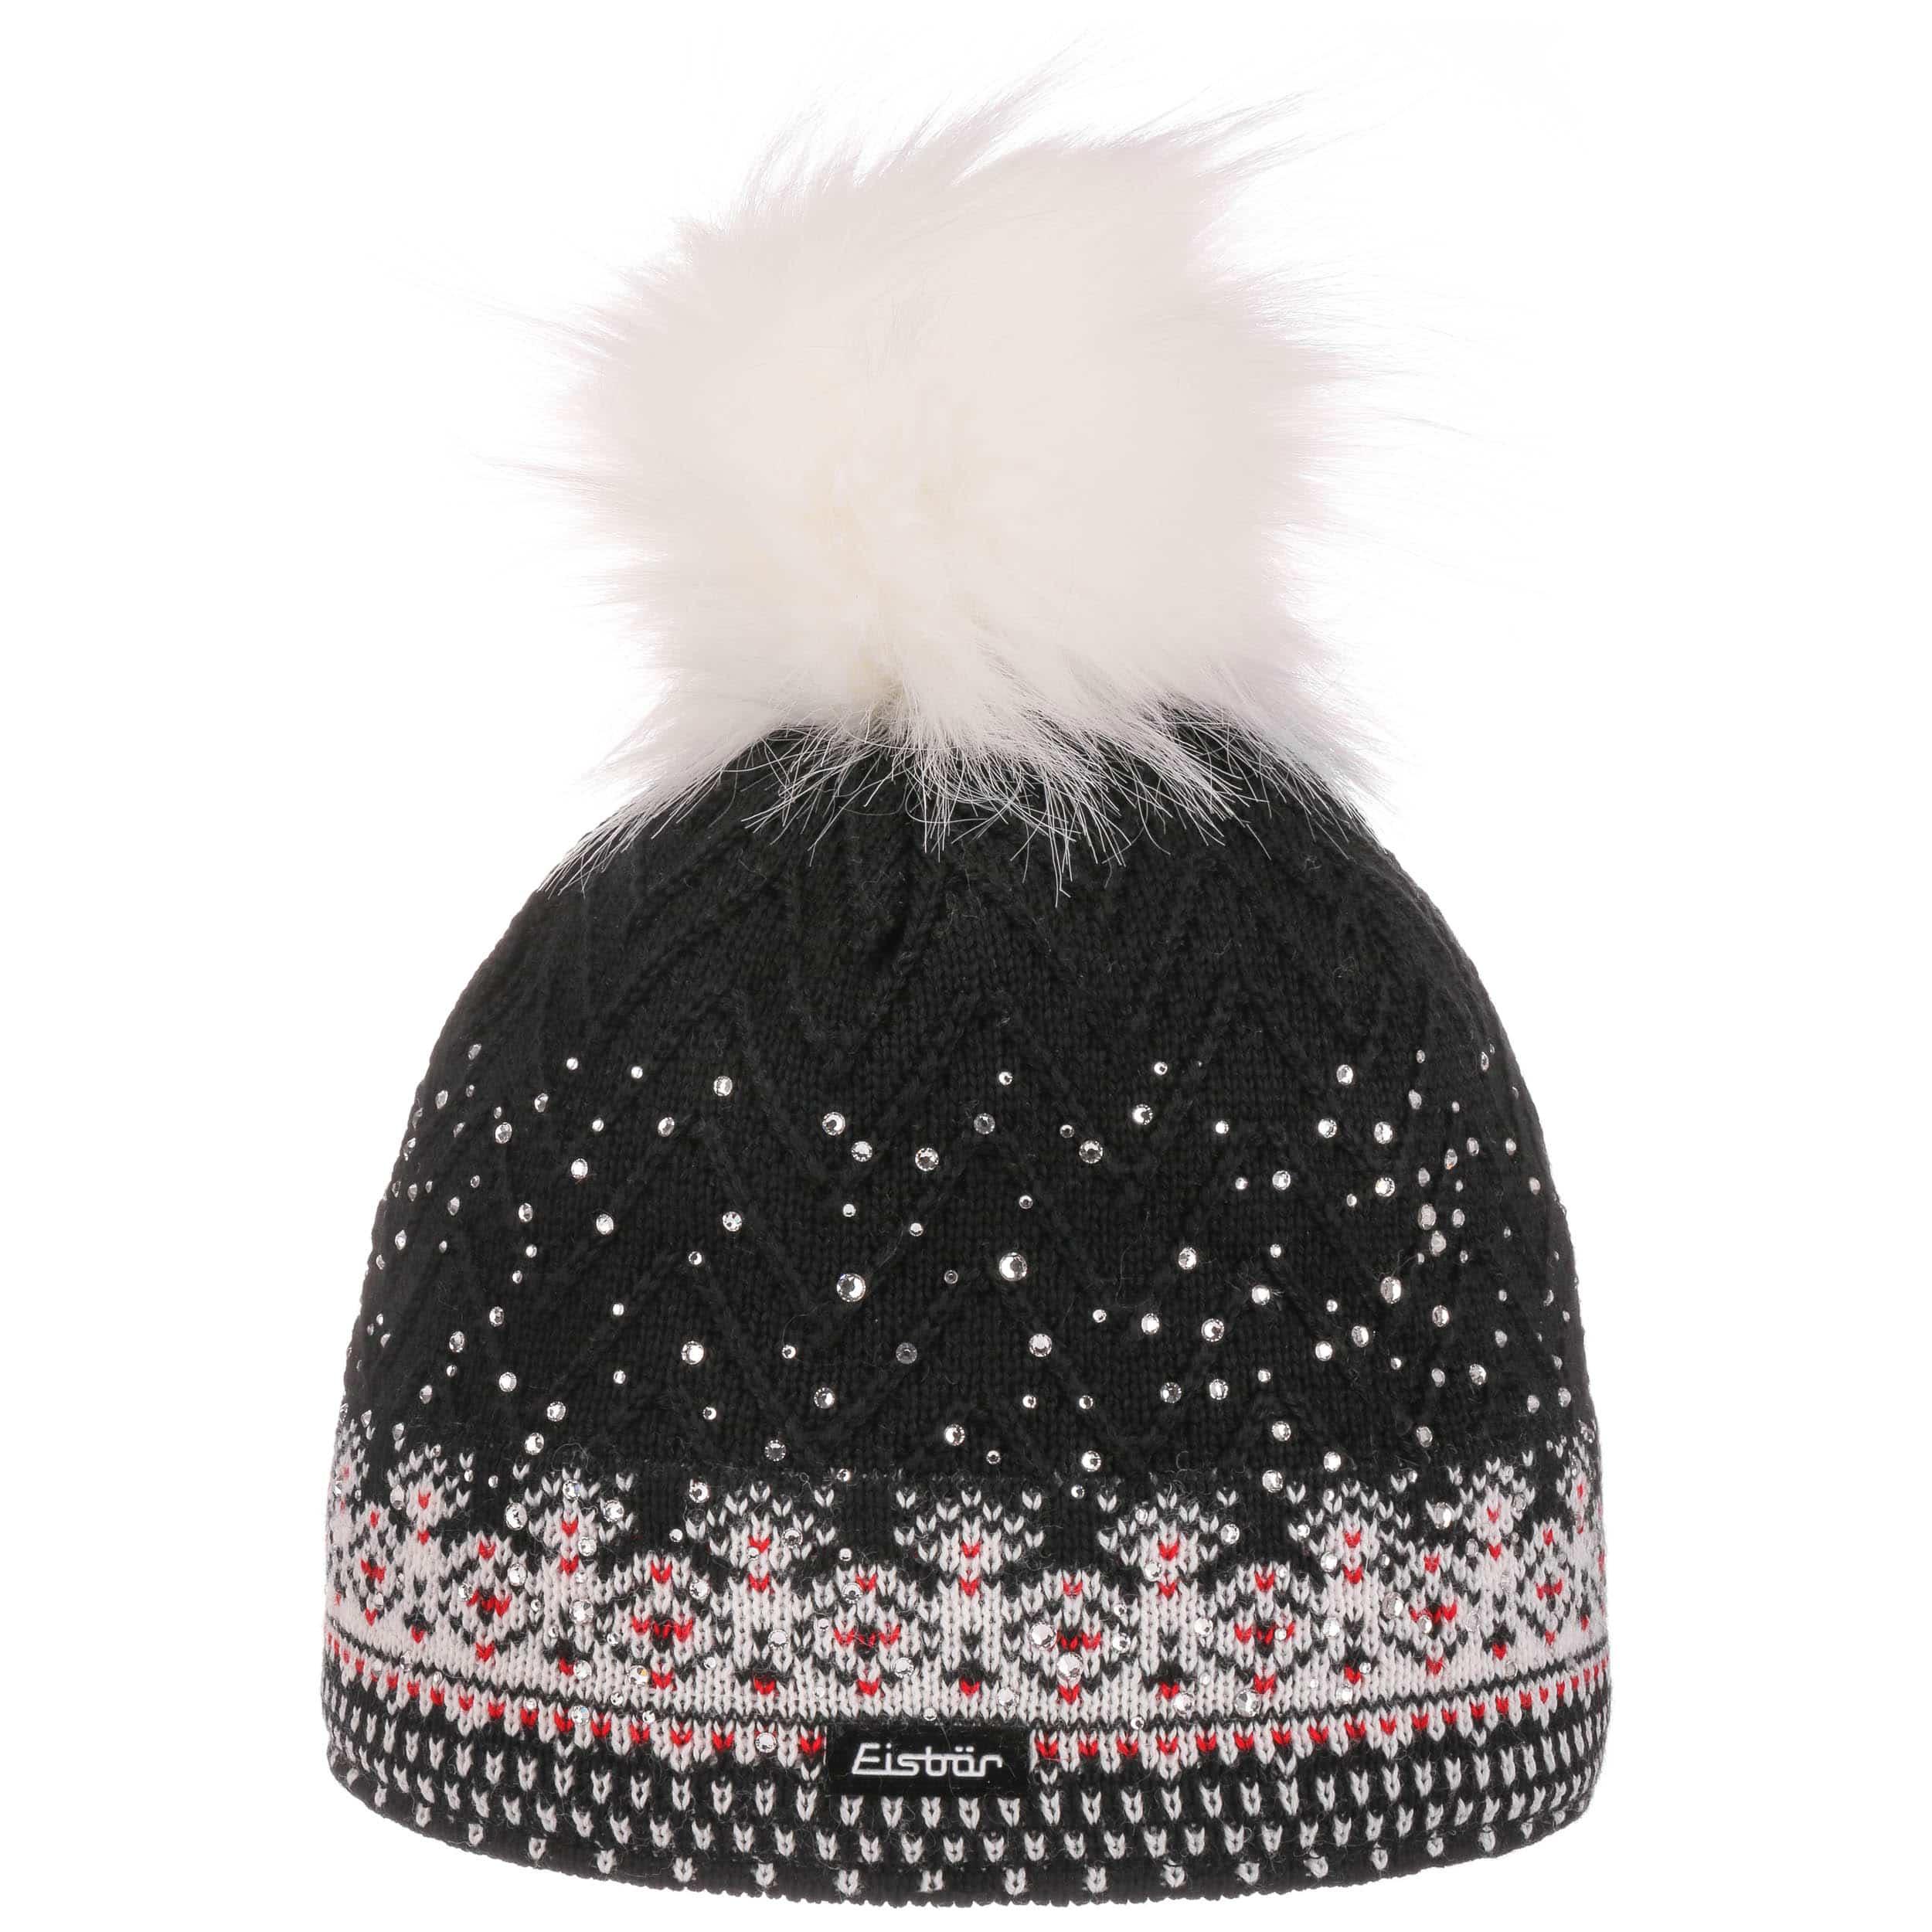 d8976da723e ... Connor Pompom Hat by Eisbär - black 4